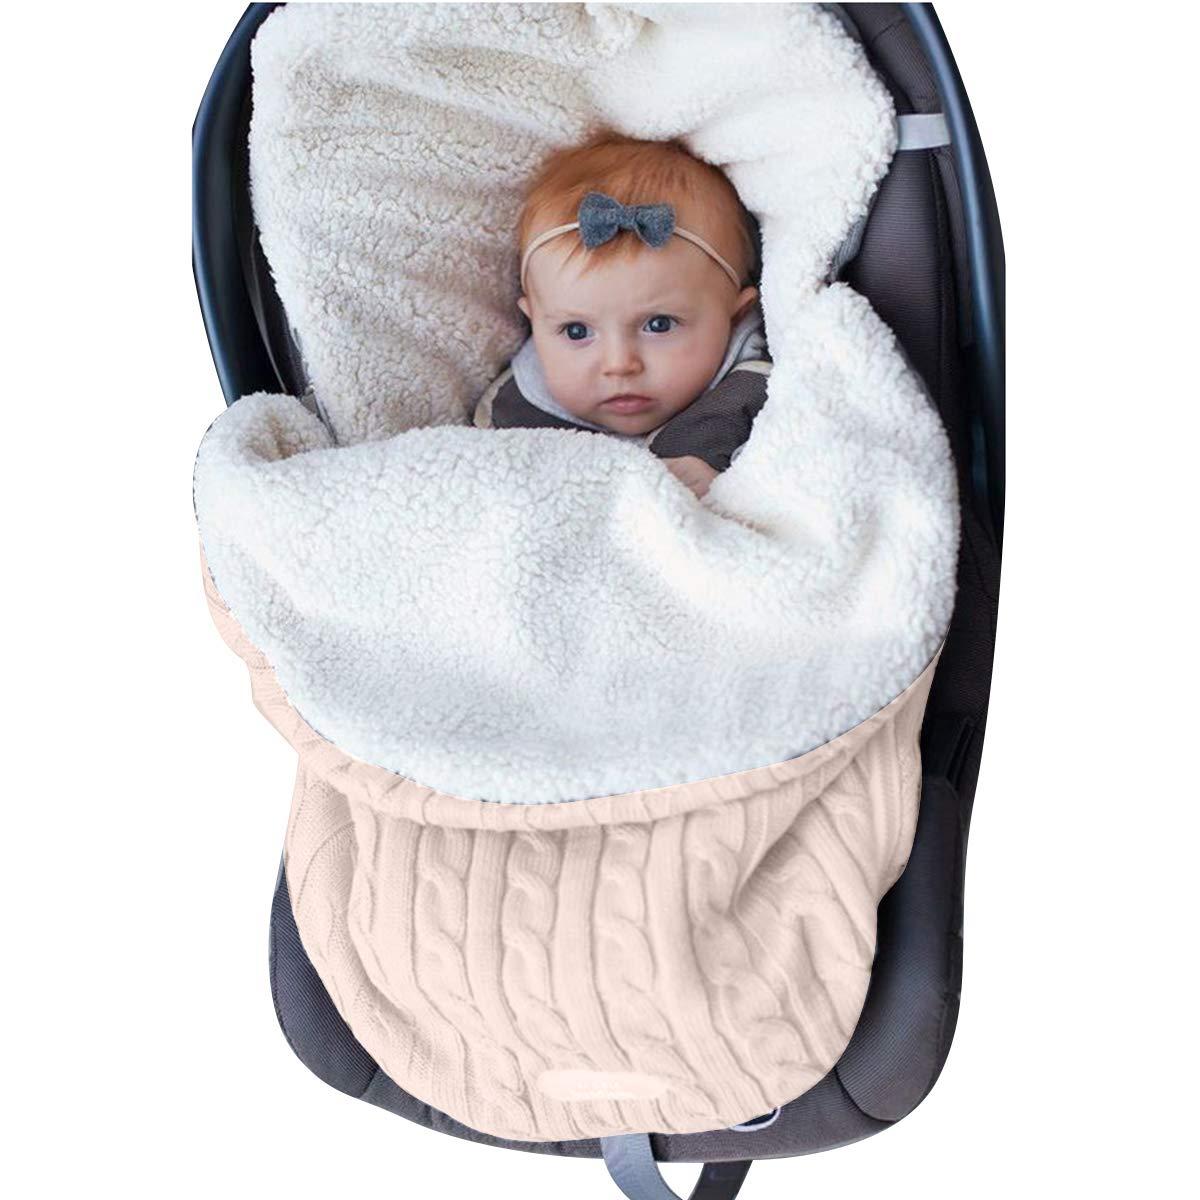 Manta para bebé con forro polar para cochecito de bebé + terciopelo beige beige Talla:24.7x 15.95